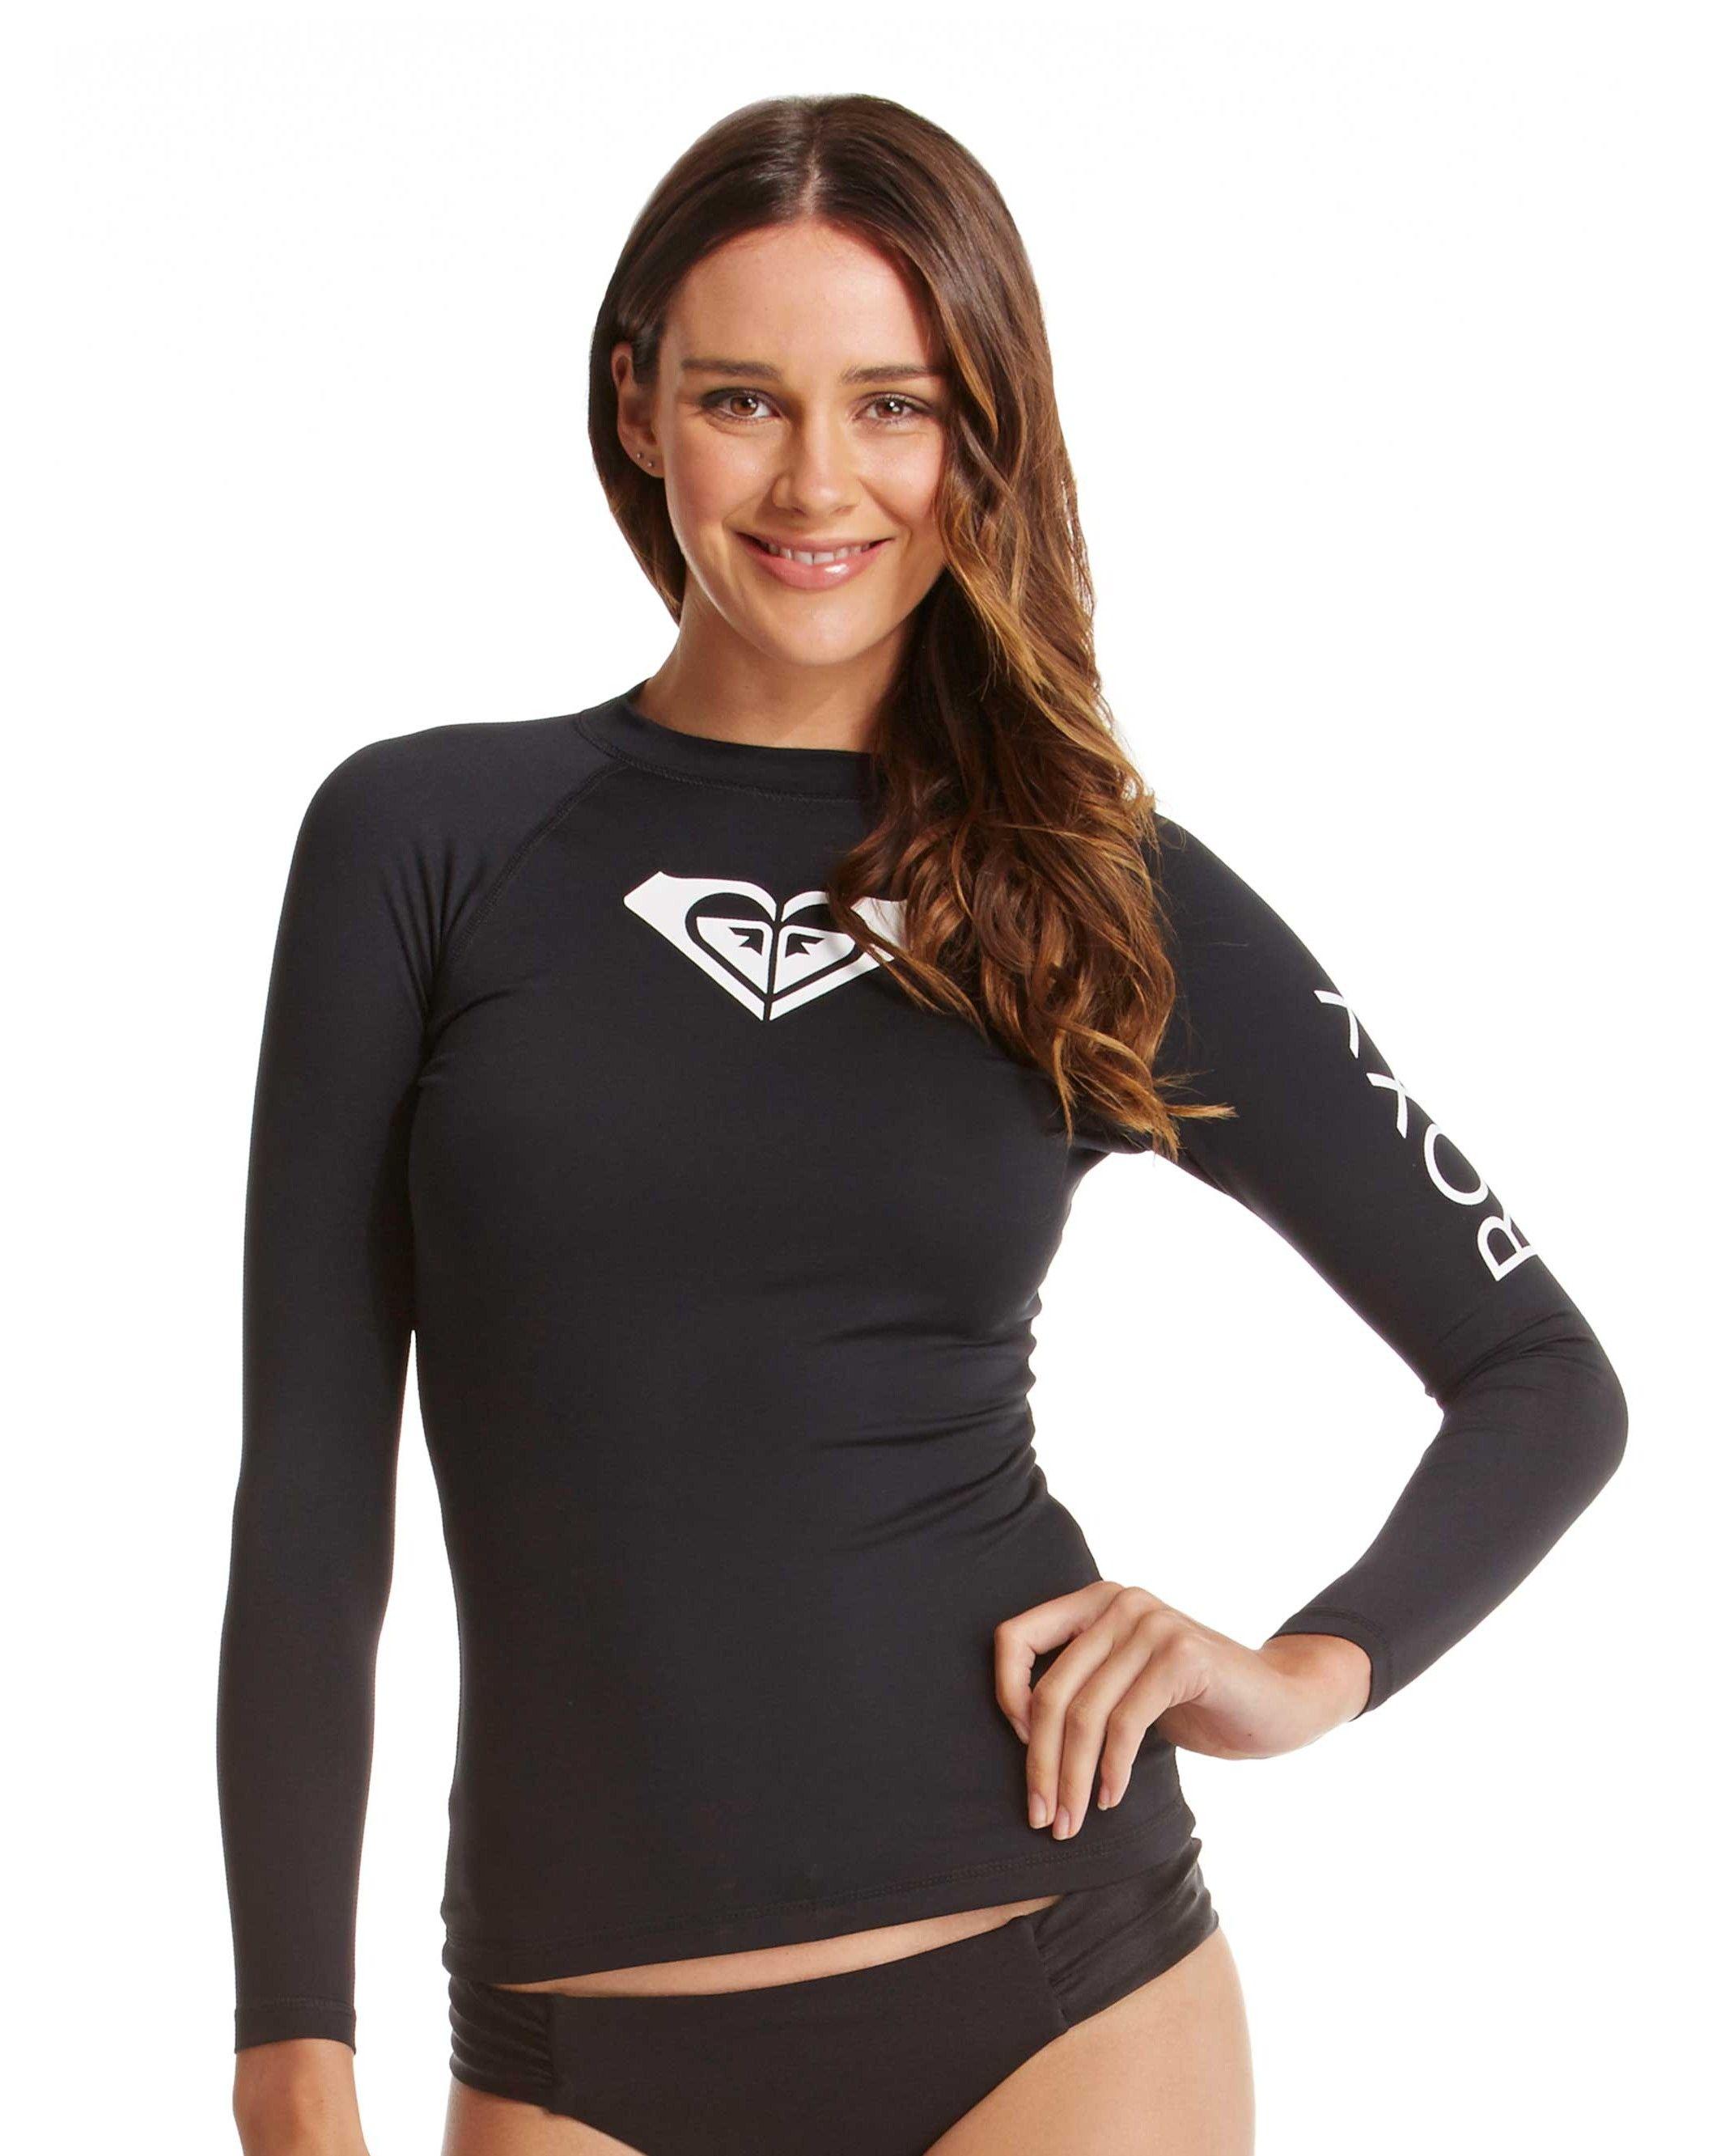 NEW-ROXY -Ladies-Whole-Hearted-Long-Sleeve-Rash-Vest-Womens-Rash-Guard-Rashsuit 600b0914941